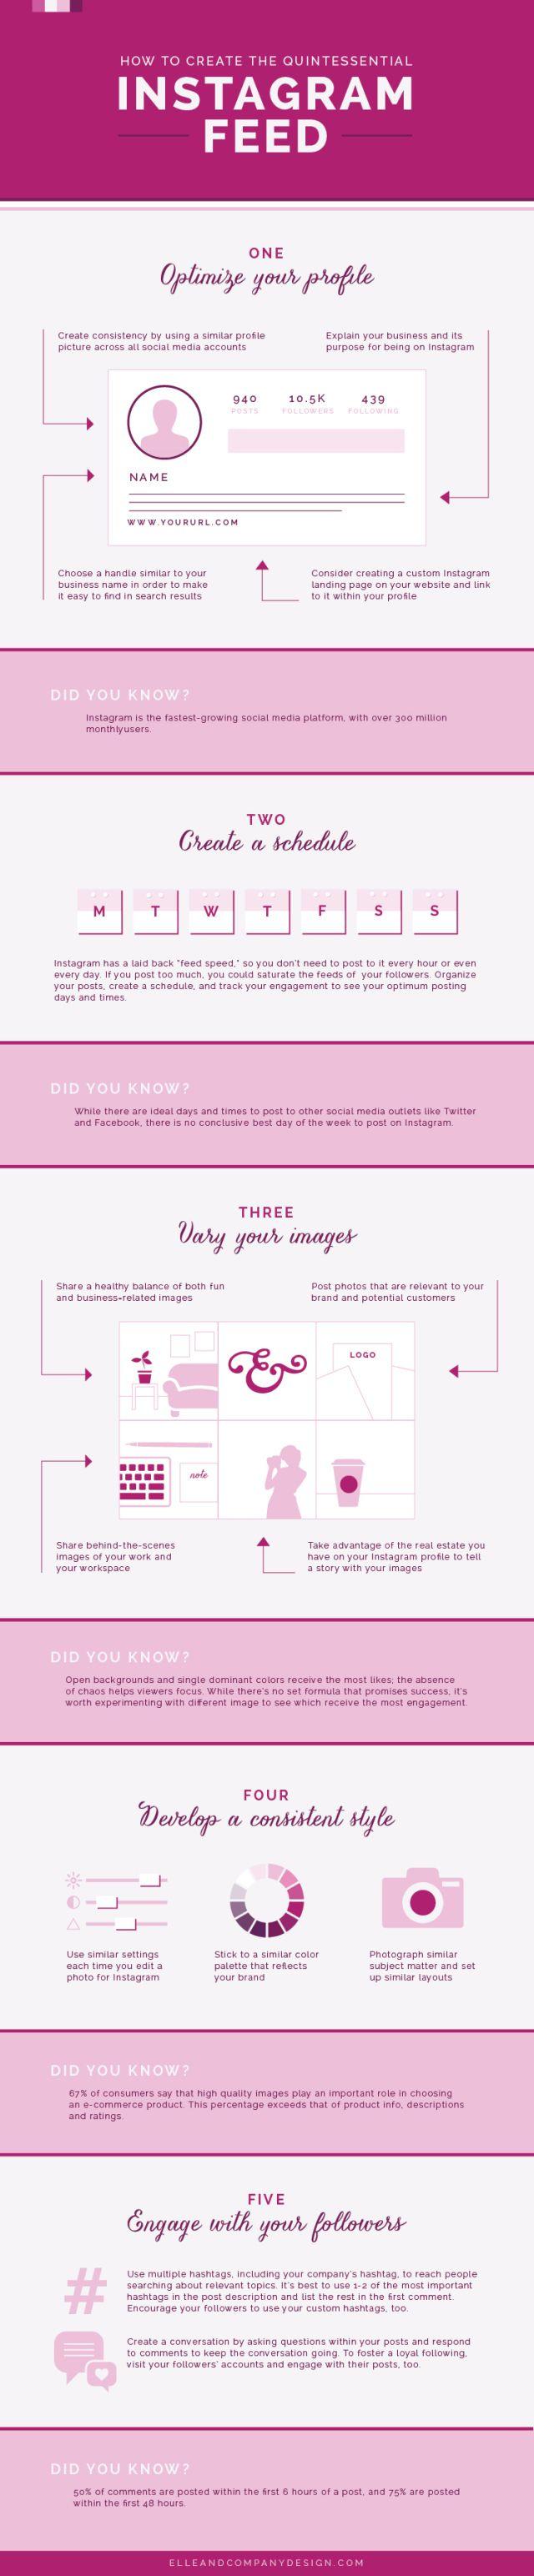 5 STEPS TO A SUCCESSFUL INSTAGRAM MARKETINGSTRATEGY (Step Design Social Media)